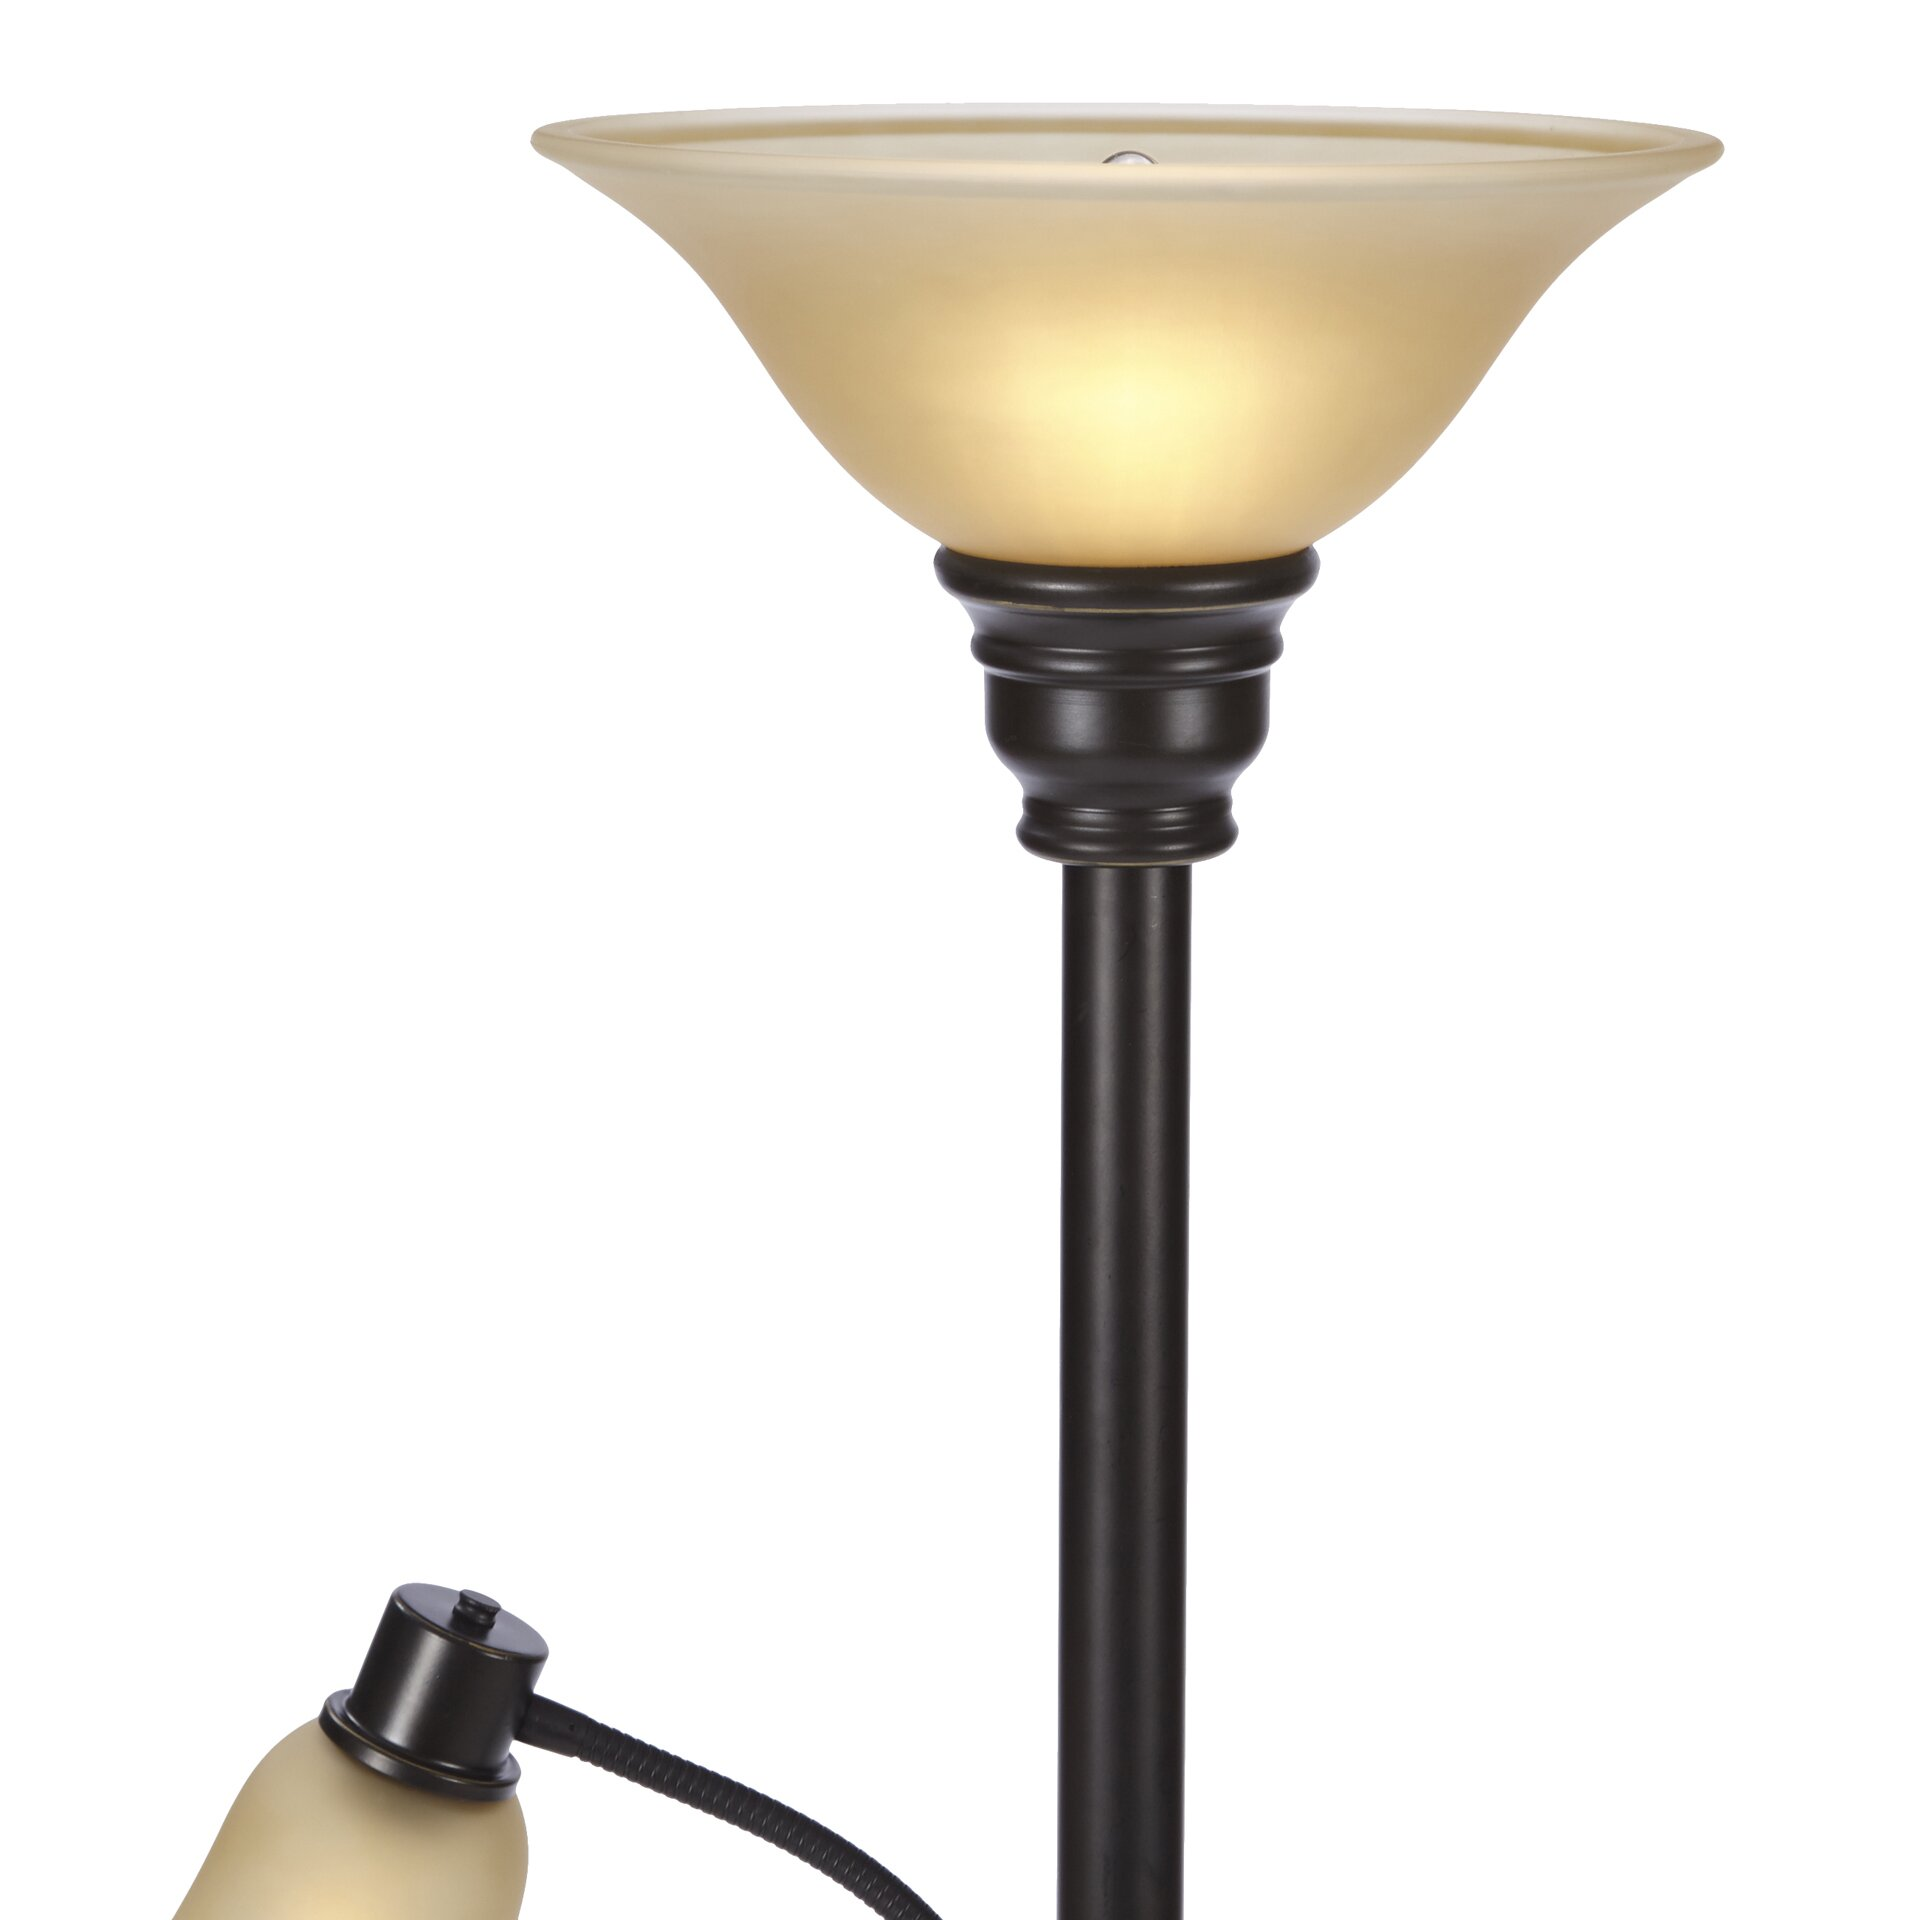 andover mills graham 71 torchiere floor lamp reviews wayfair. Black Bedroom Furniture Sets. Home Design Ideas